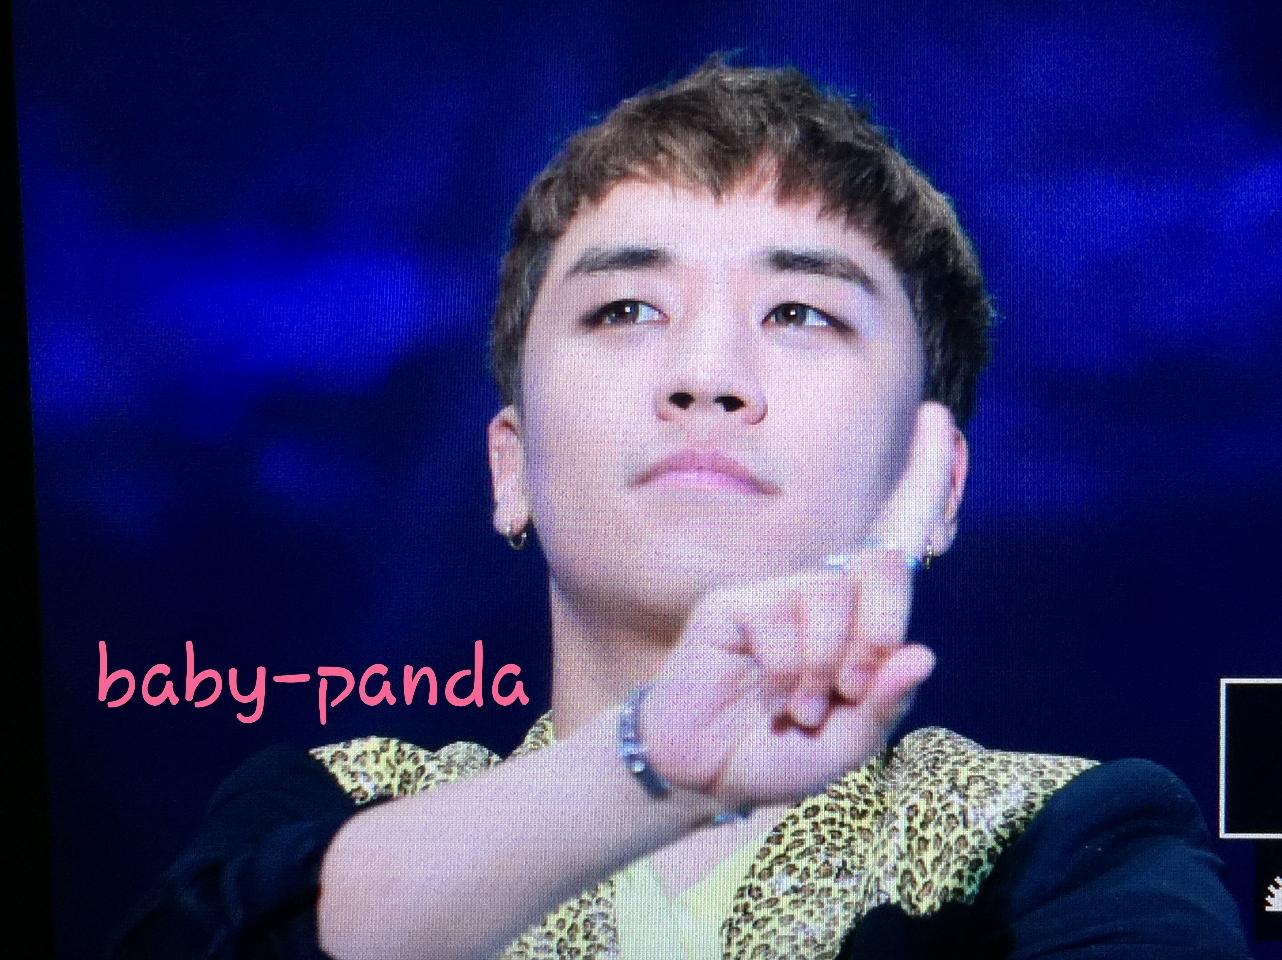 BIGBANG - Made Tour 2015 - Hangzhou - 25aug2015 - Baby Panda - 01.jpg